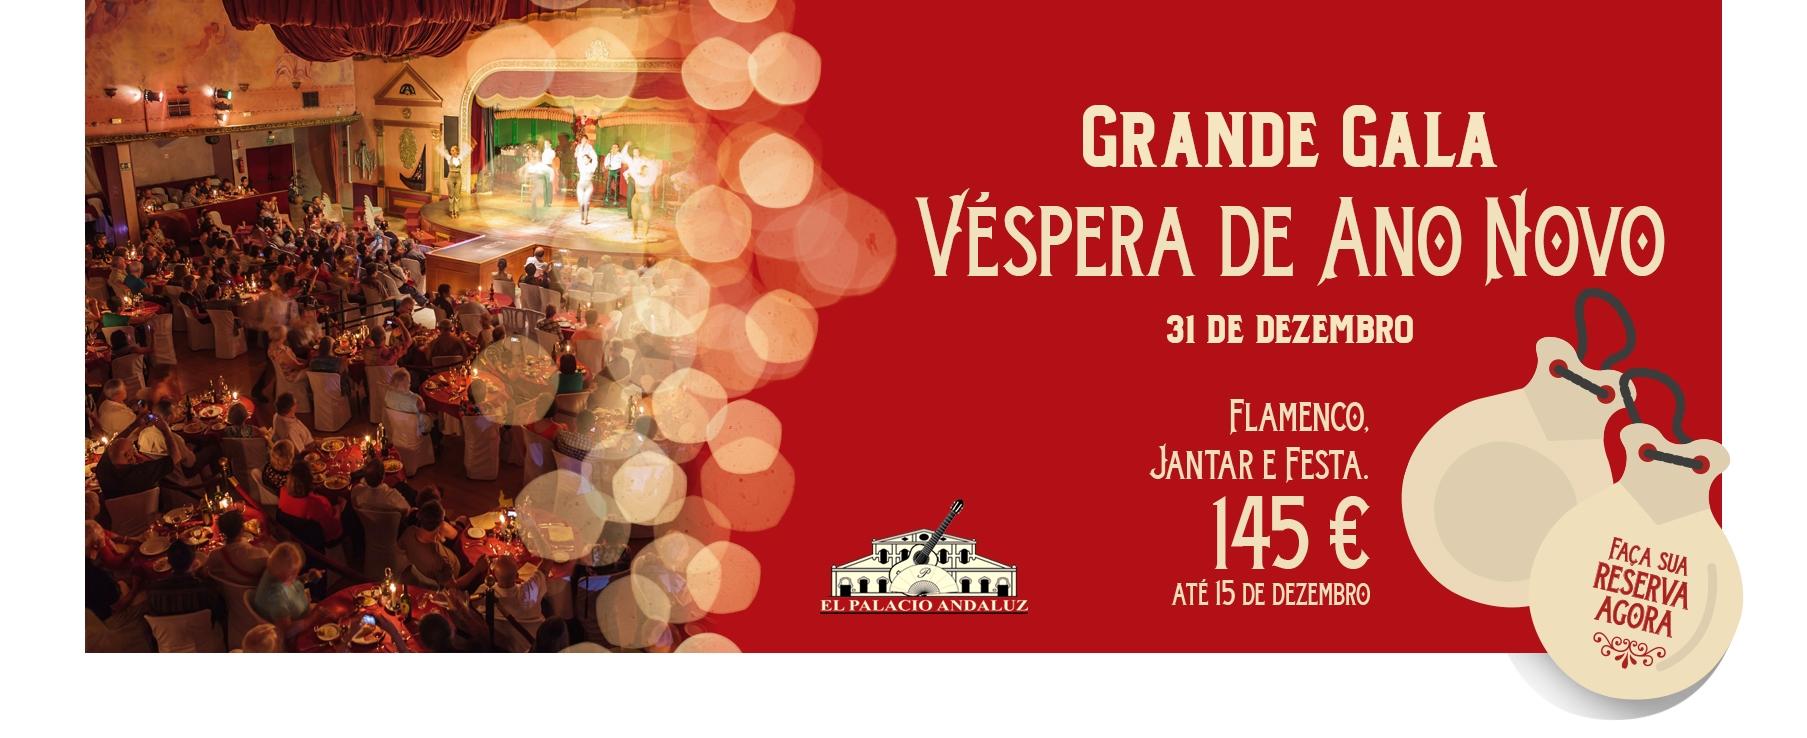 Grande Gala Vespera Ano Novo Sevilla